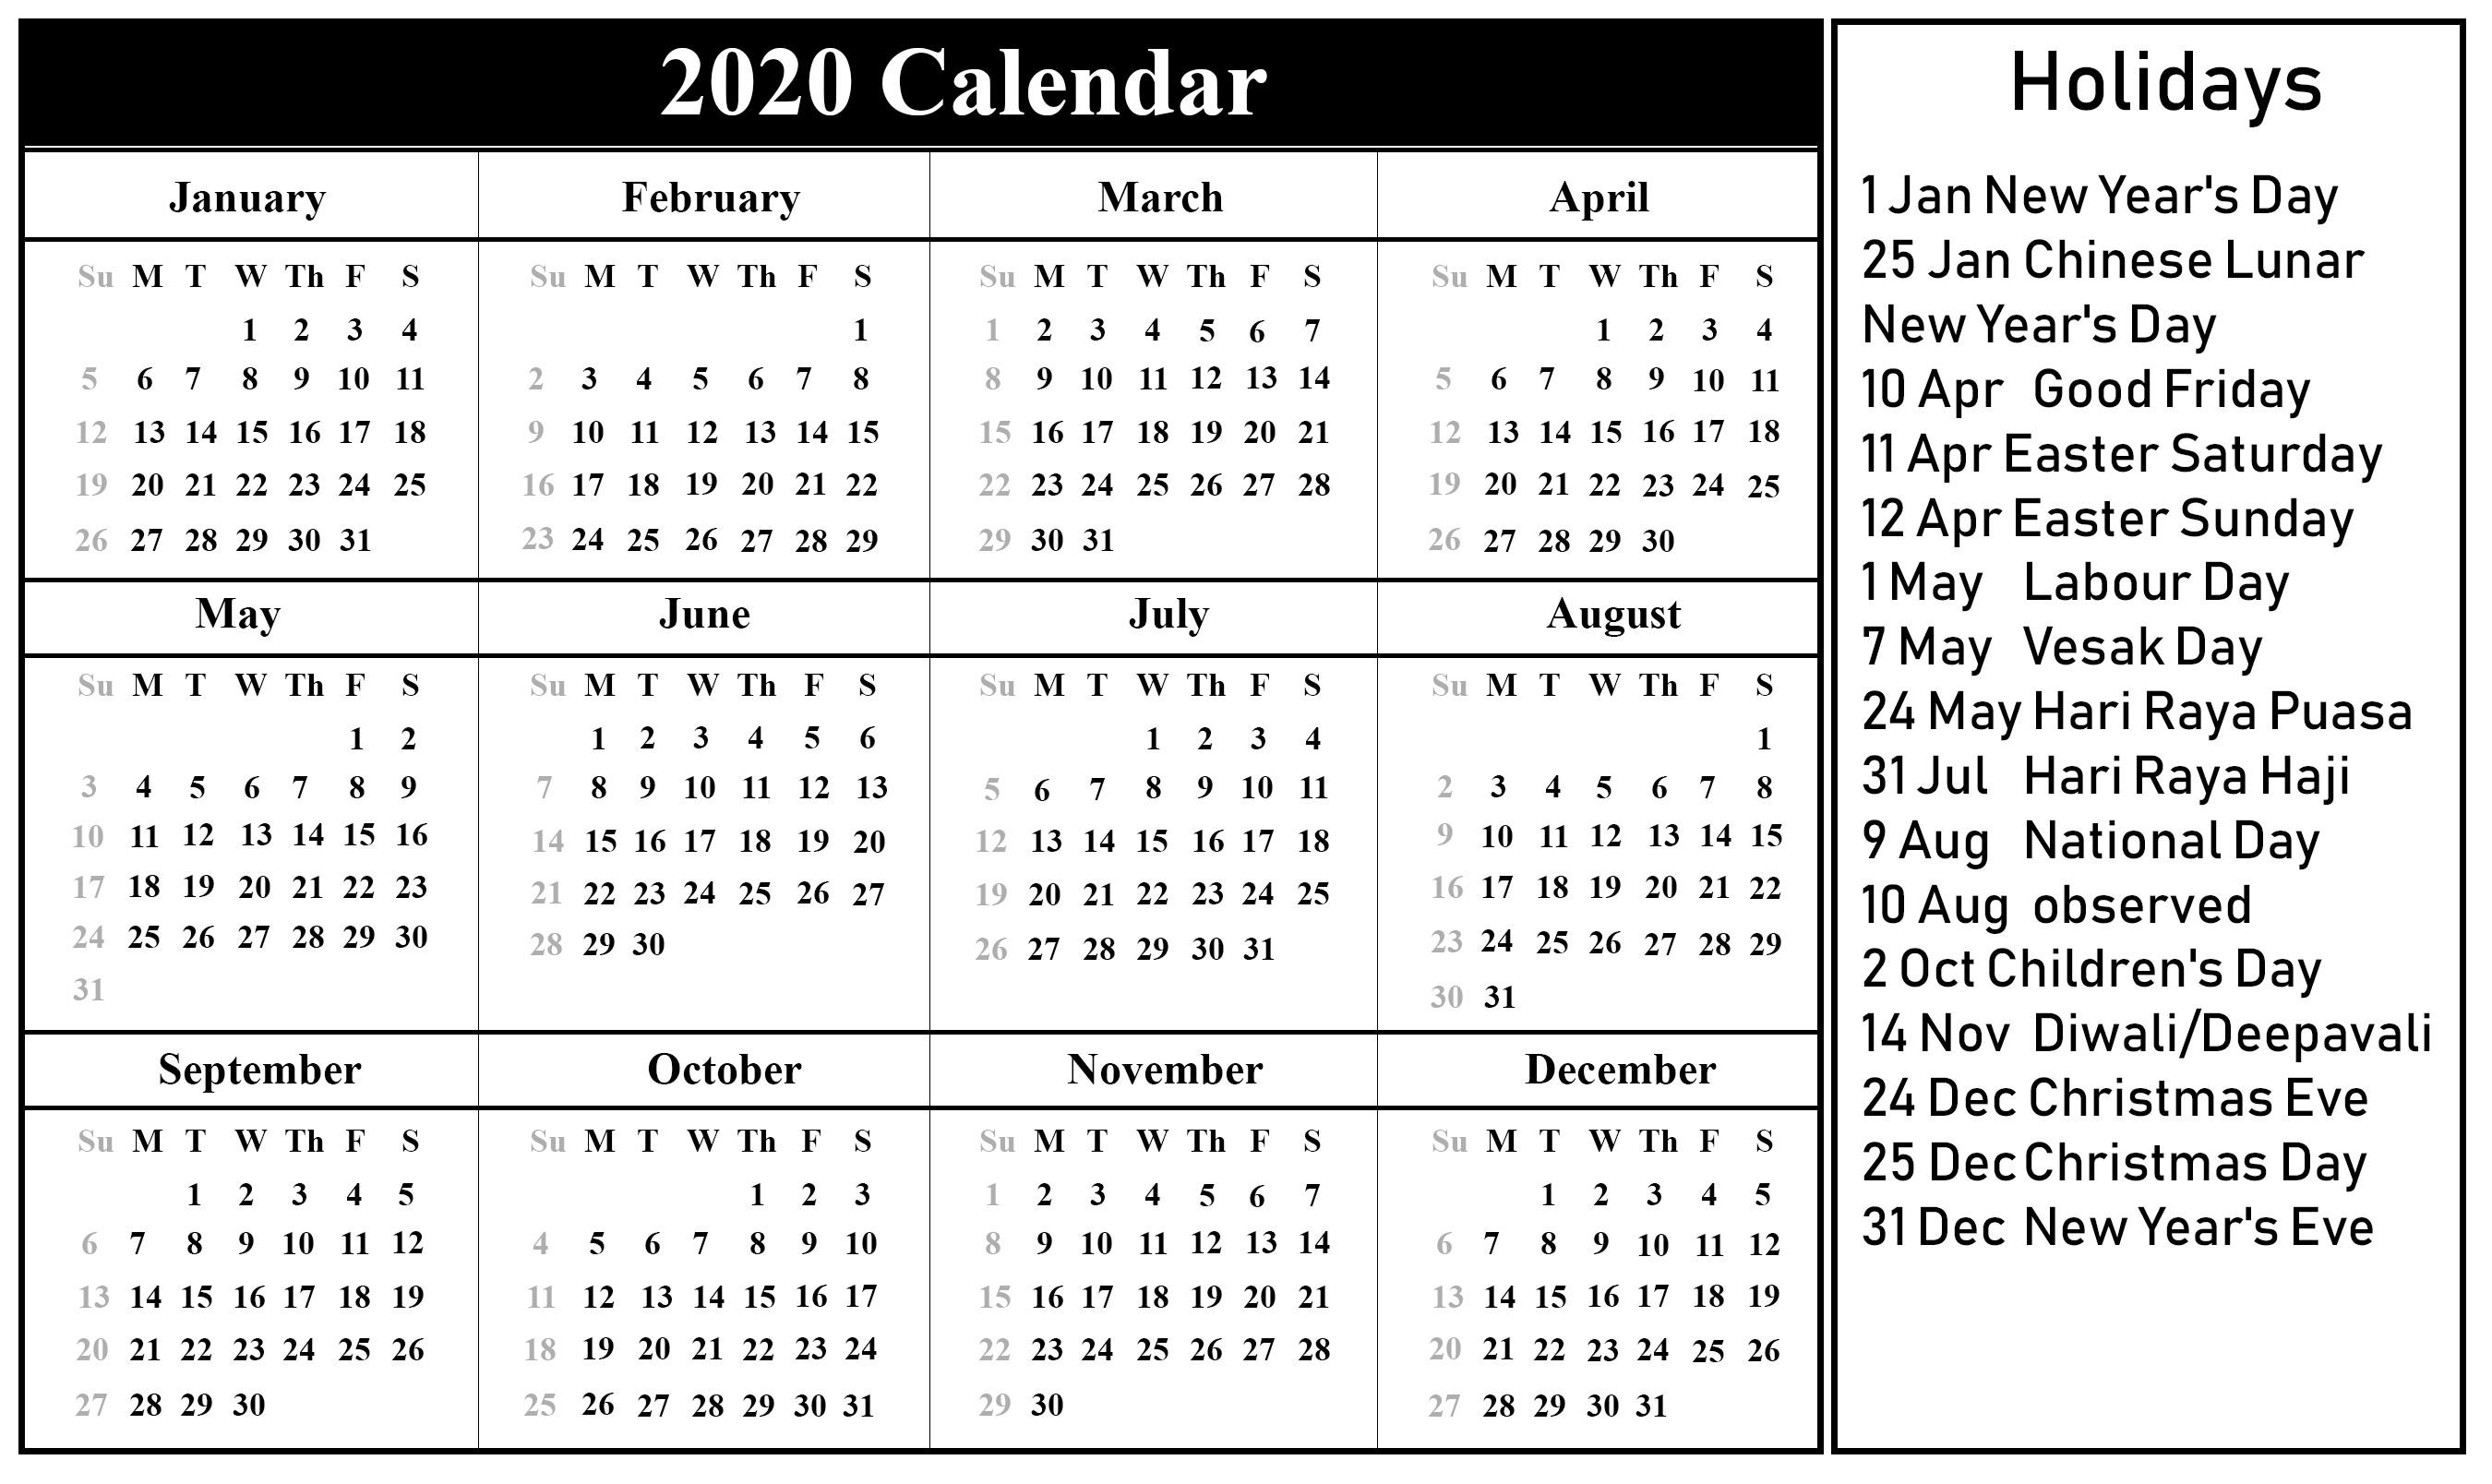 2020 Calendar with Holidays Printable Free Download Singapore 2020 Calendar Pdf & Excel & Word